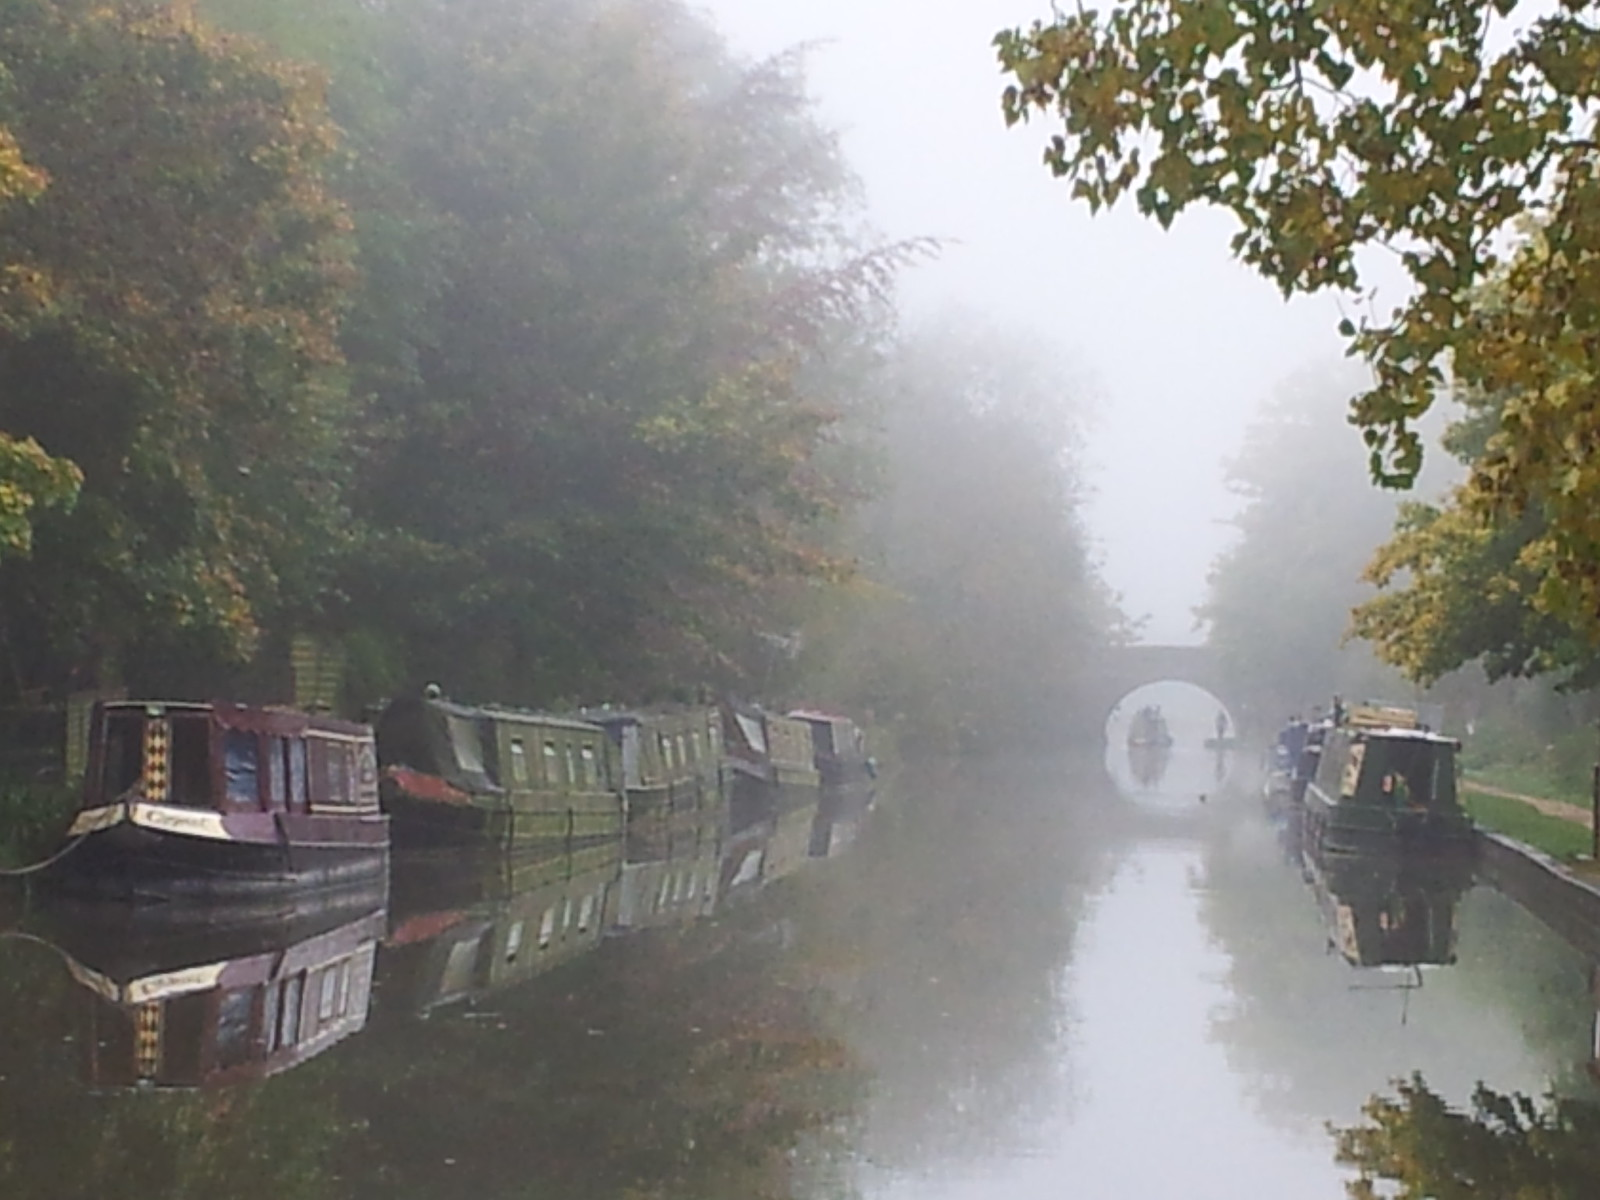 Misty Avon Canal